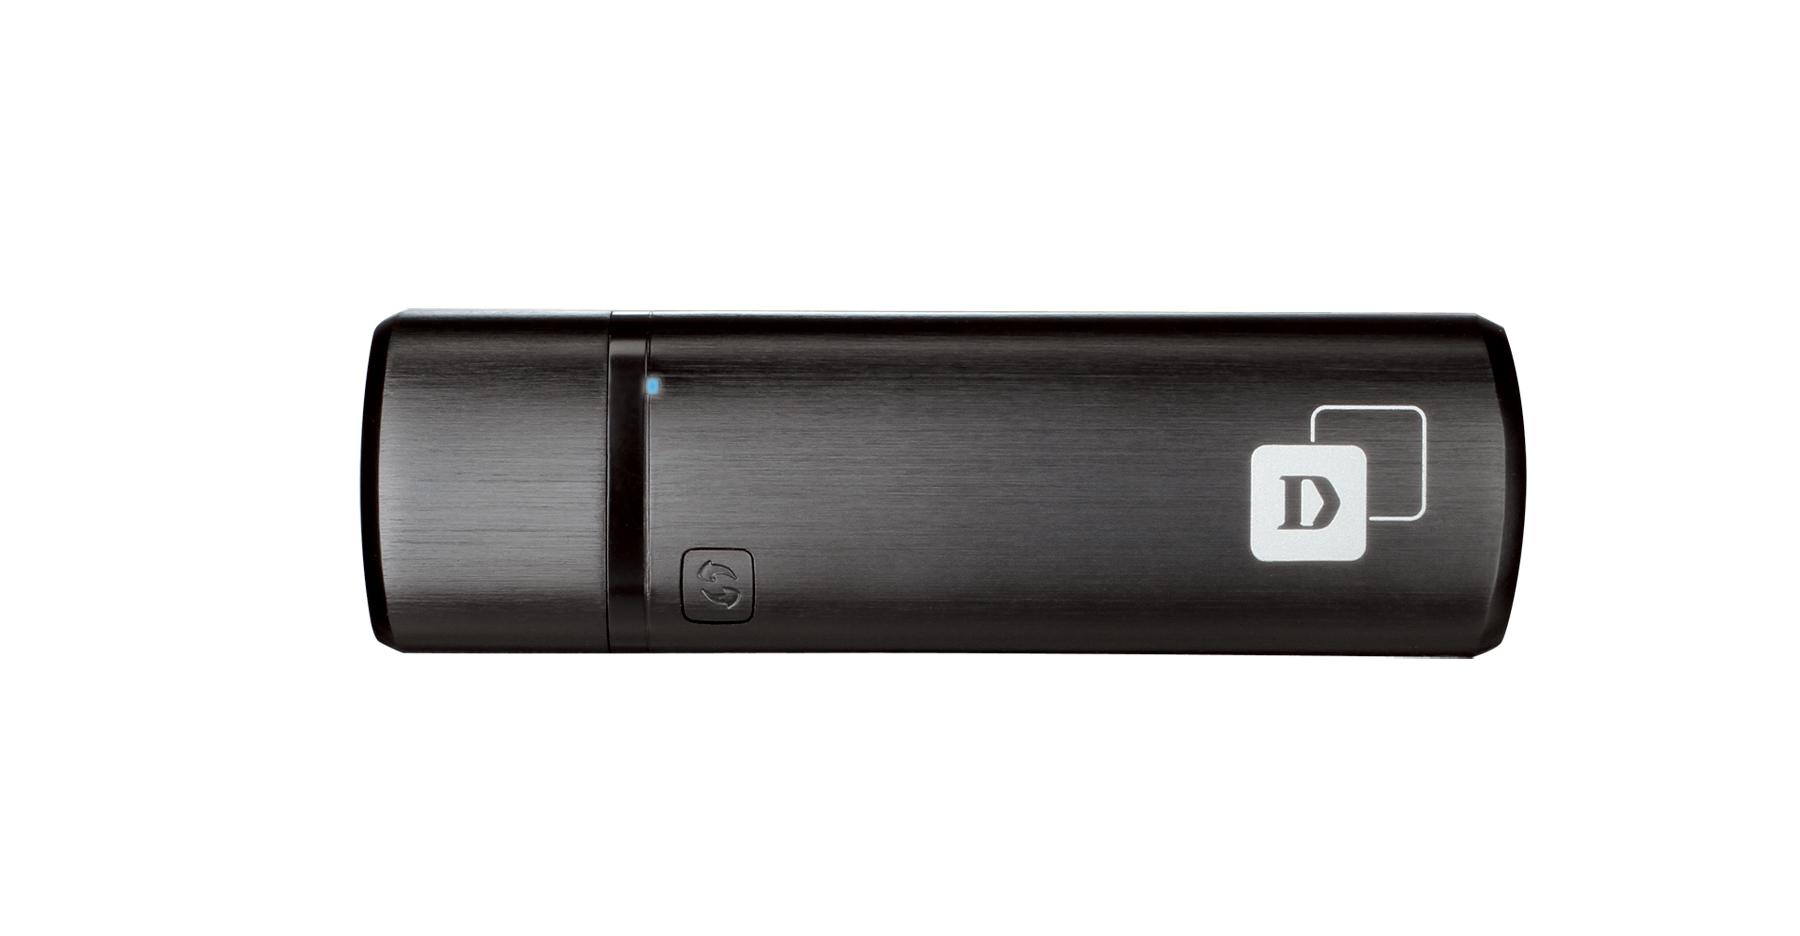 D-Link AC1200 DWA-182